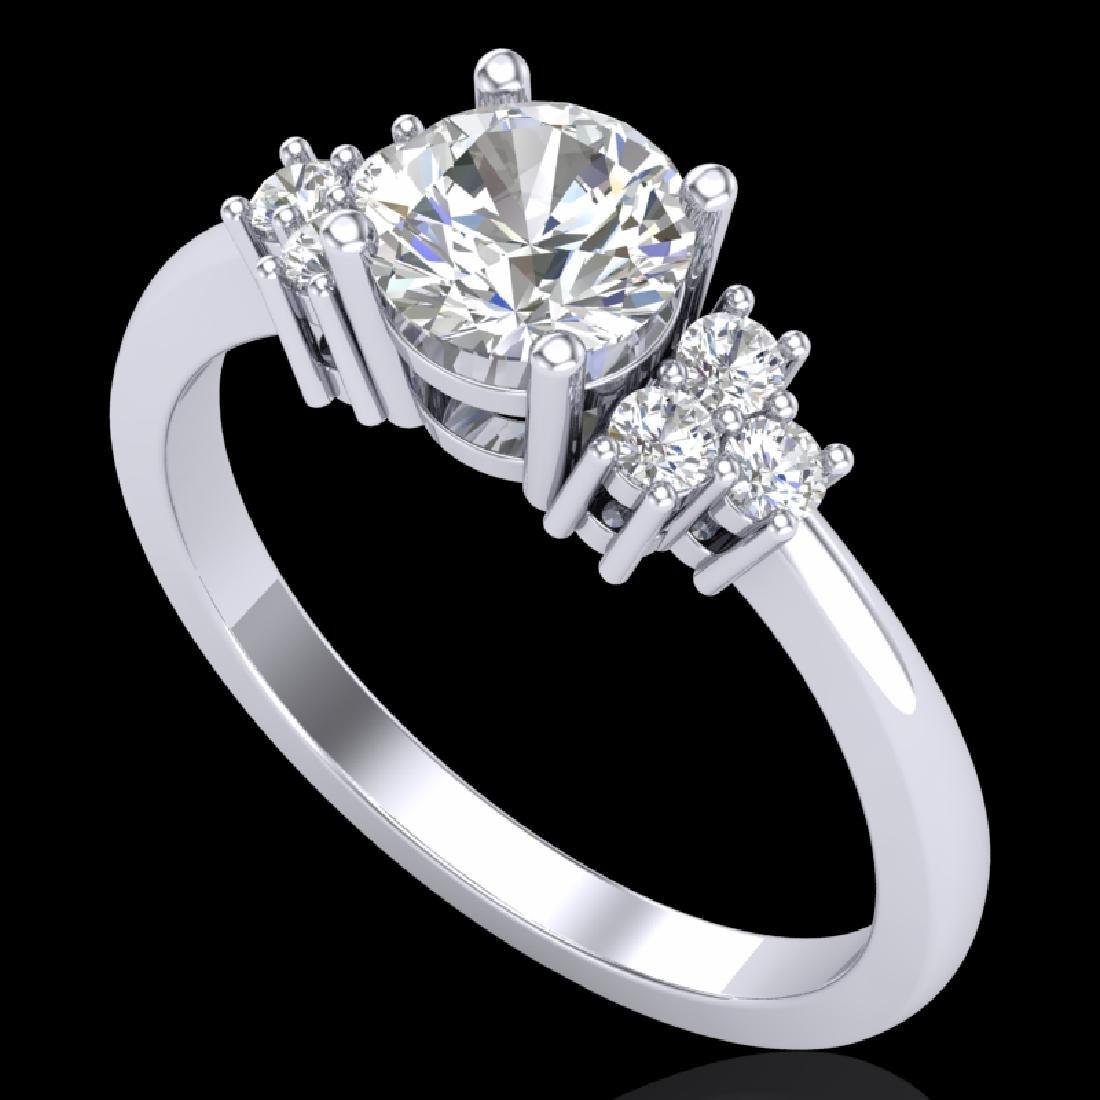 1 CTW VS/SI Diamond Solitaire Ring 18K White Gold